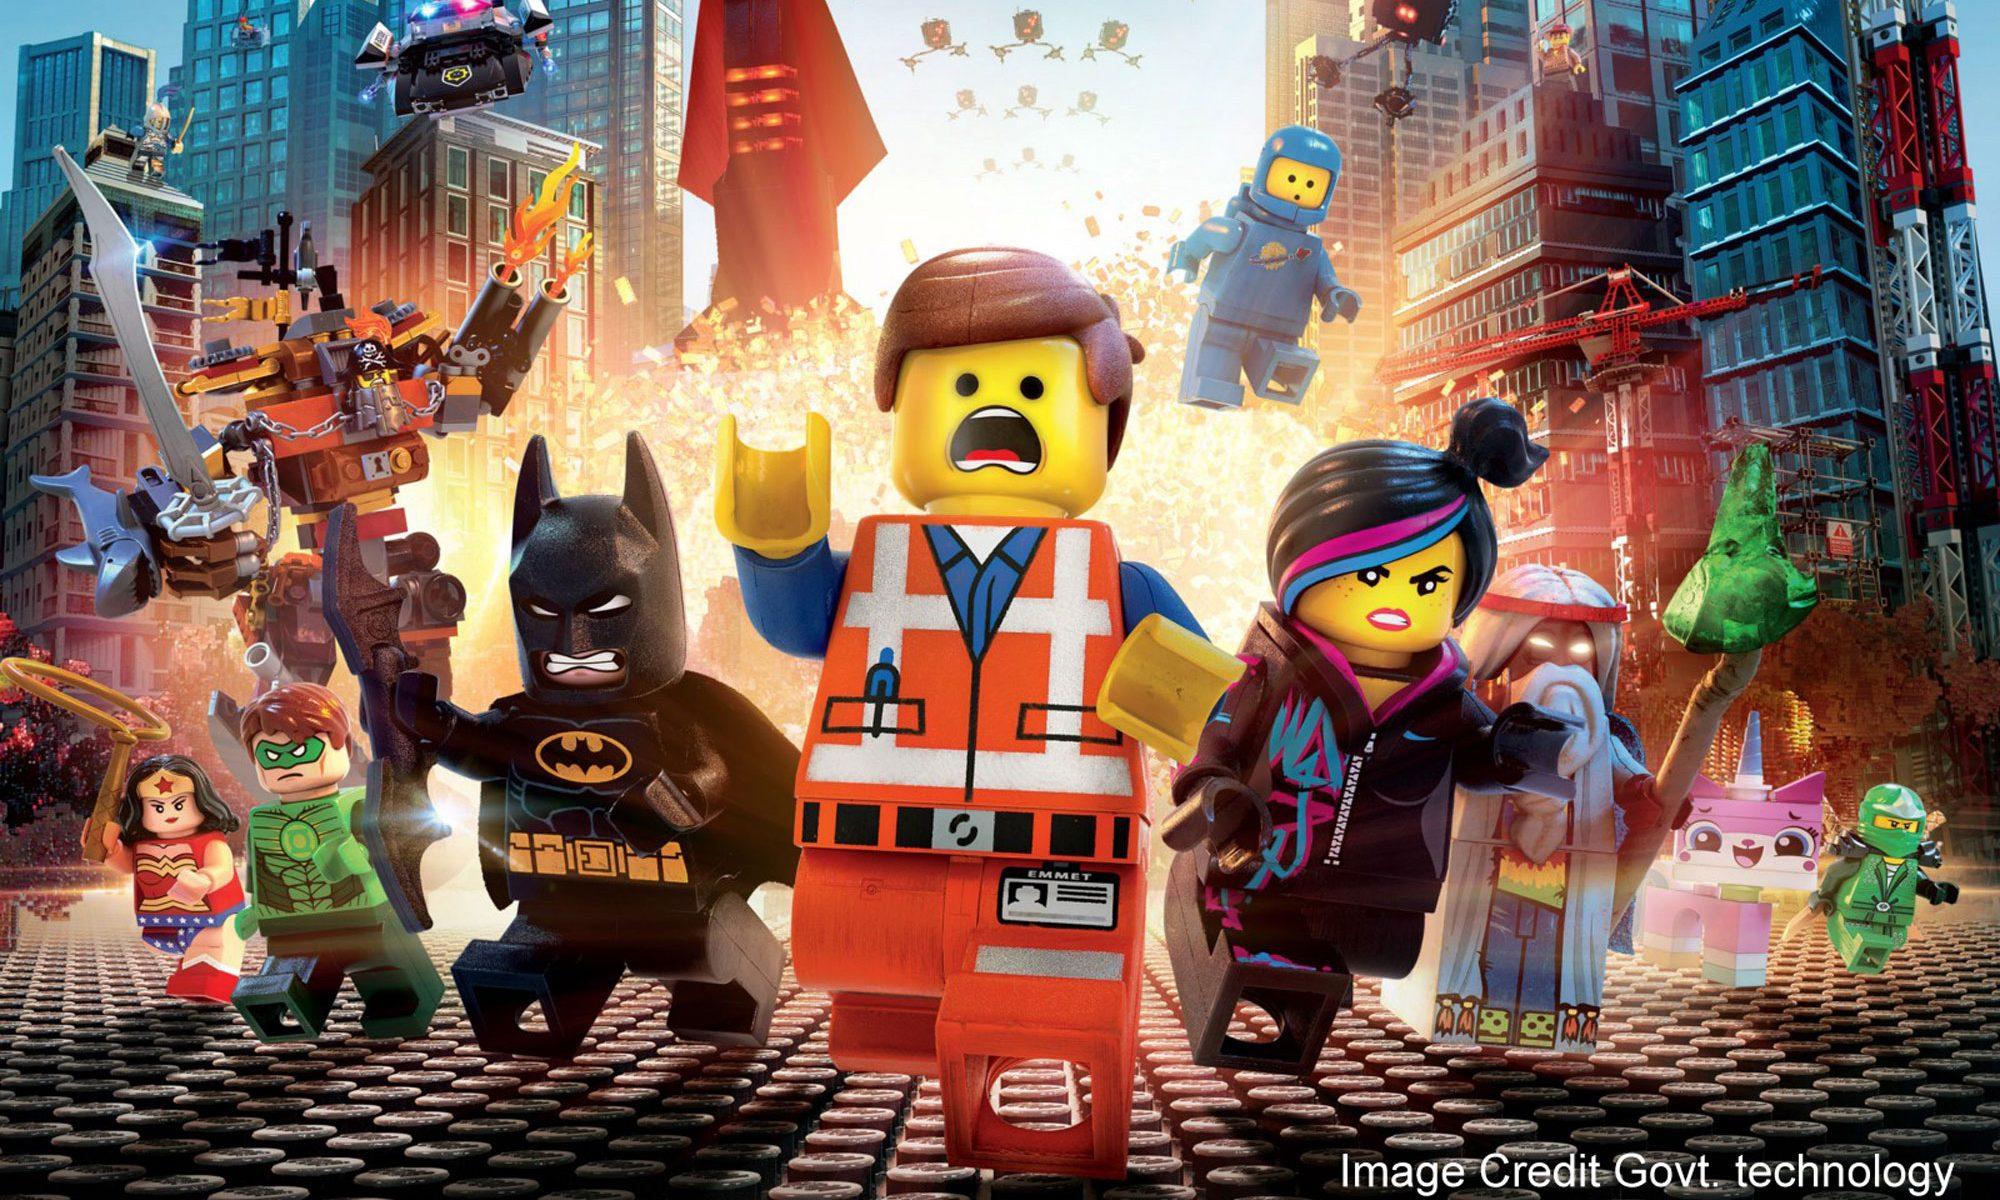 Lego Uses Social Media To Enhance The Customer Experience